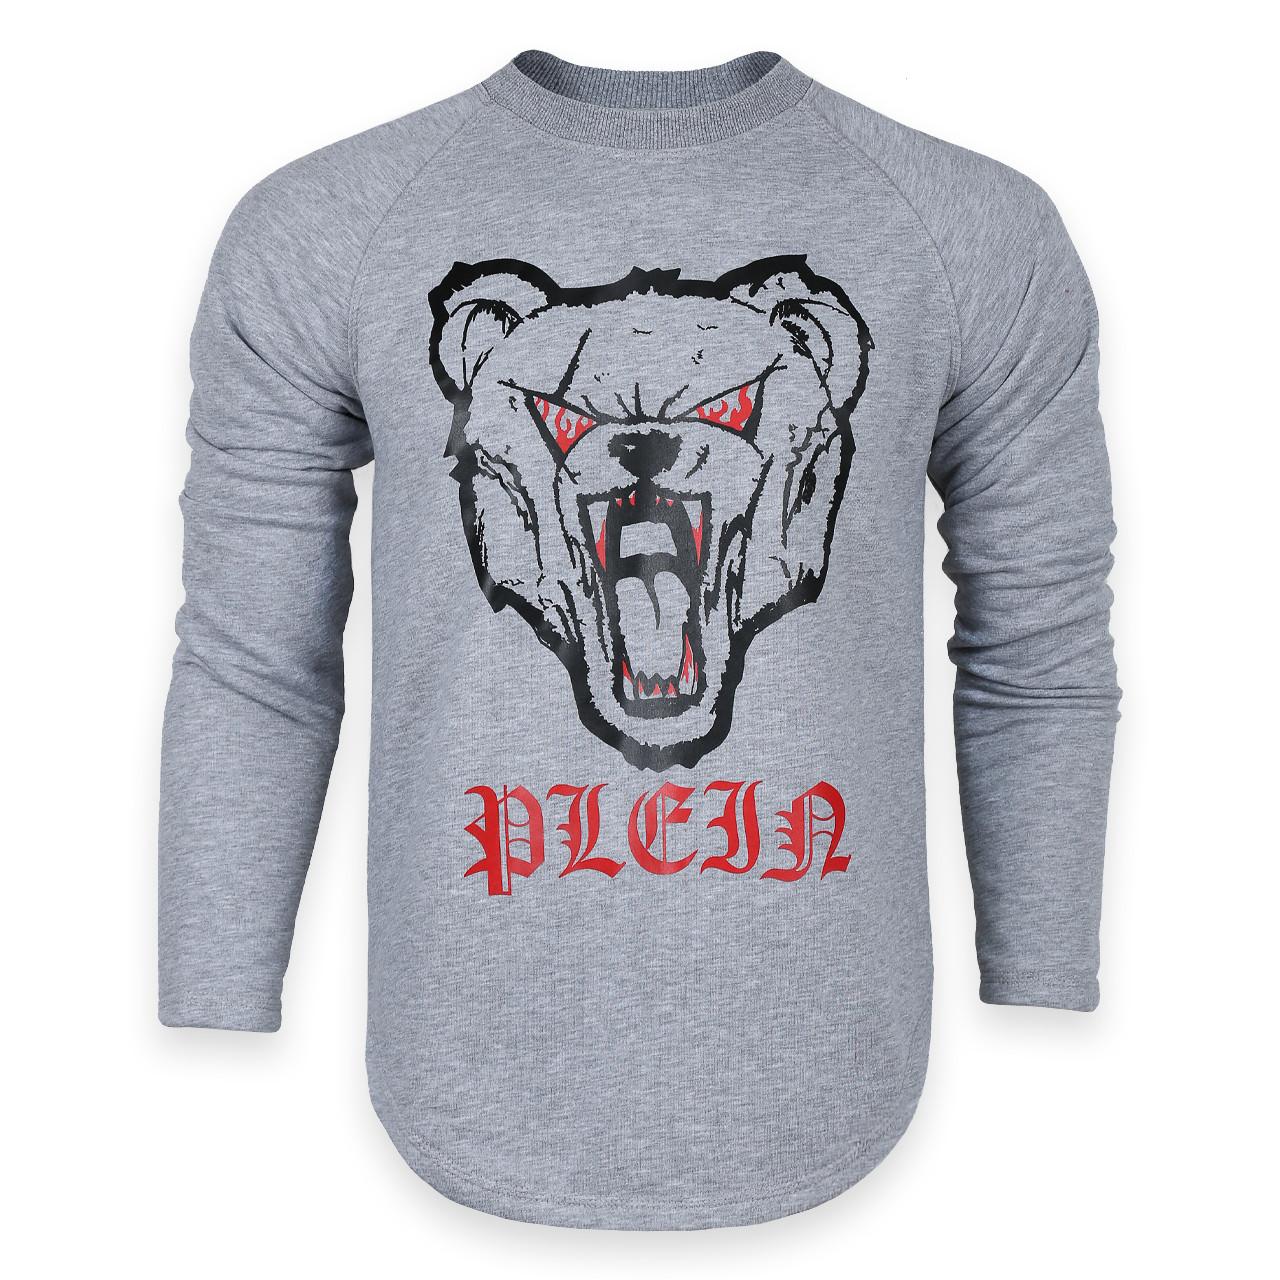 Свитшот мужской меланж PHILIPP PLEIN с принтом Медведь злой №2 Р-2 GRI M(Р) 20-544-201